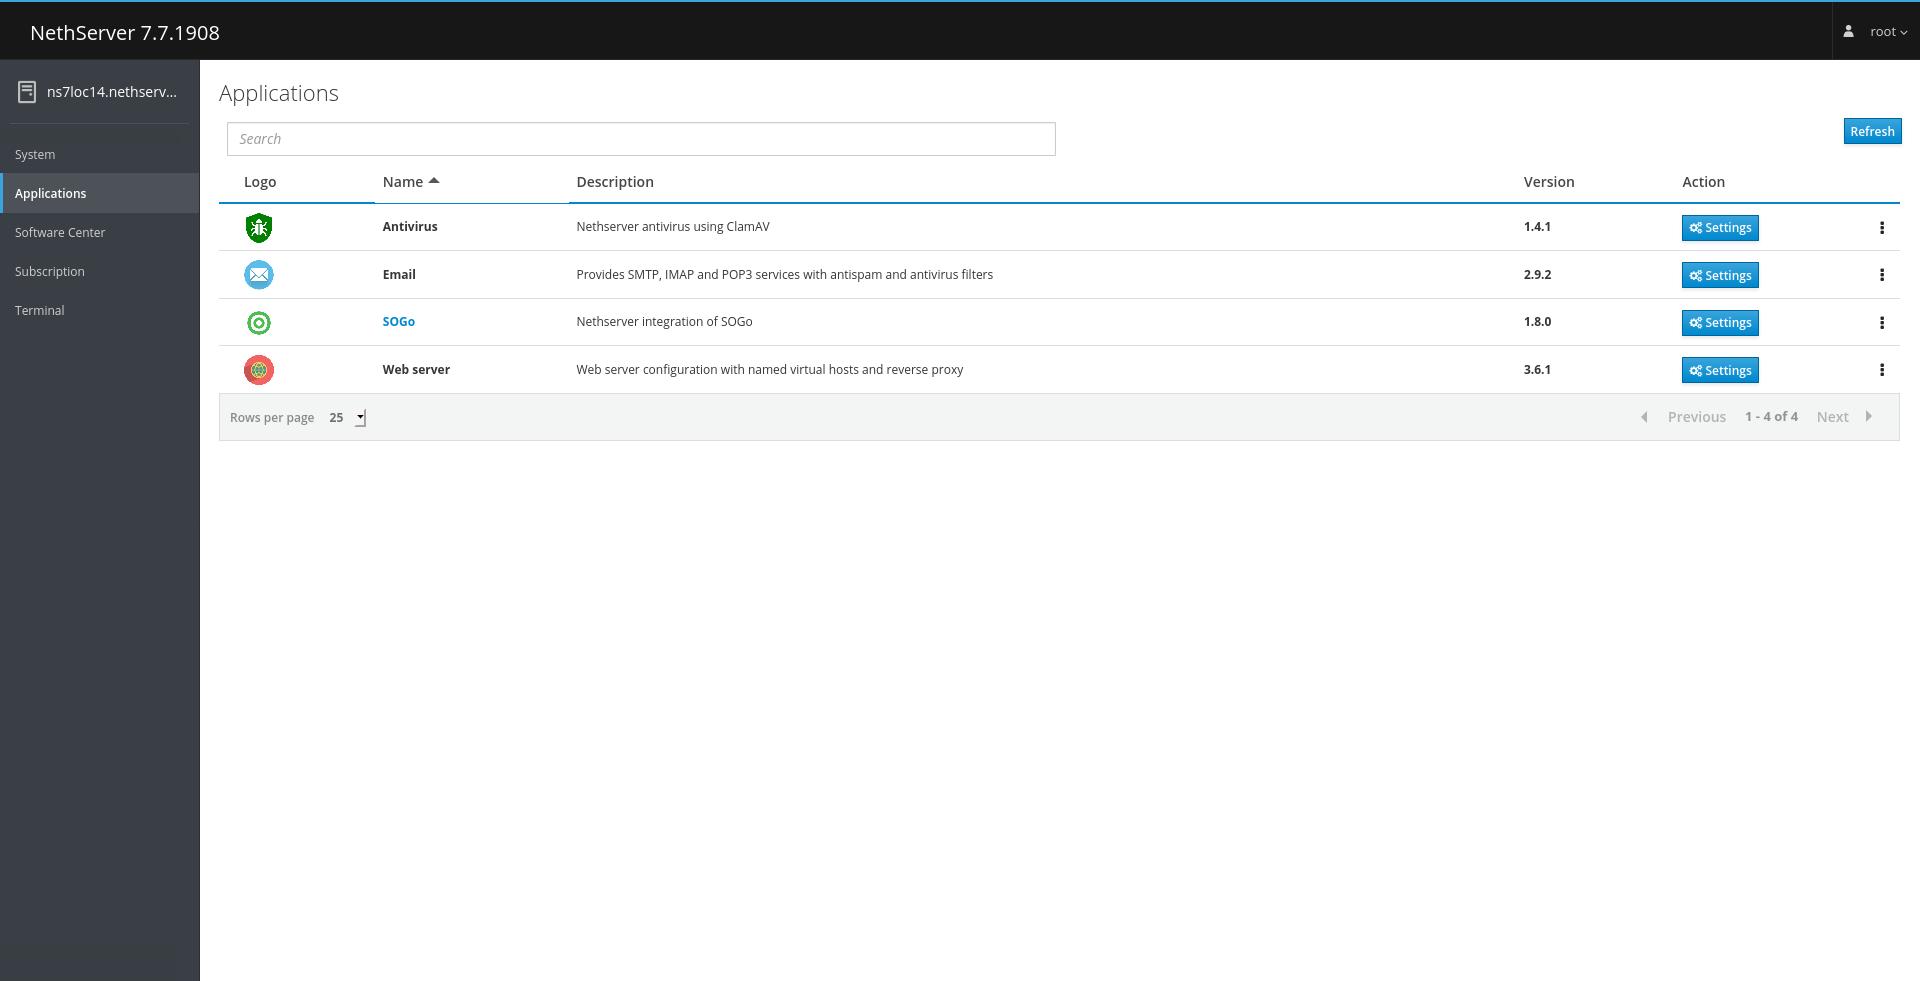 Screenshot_2019-12-09 System - ns7loc14 nethservertest org